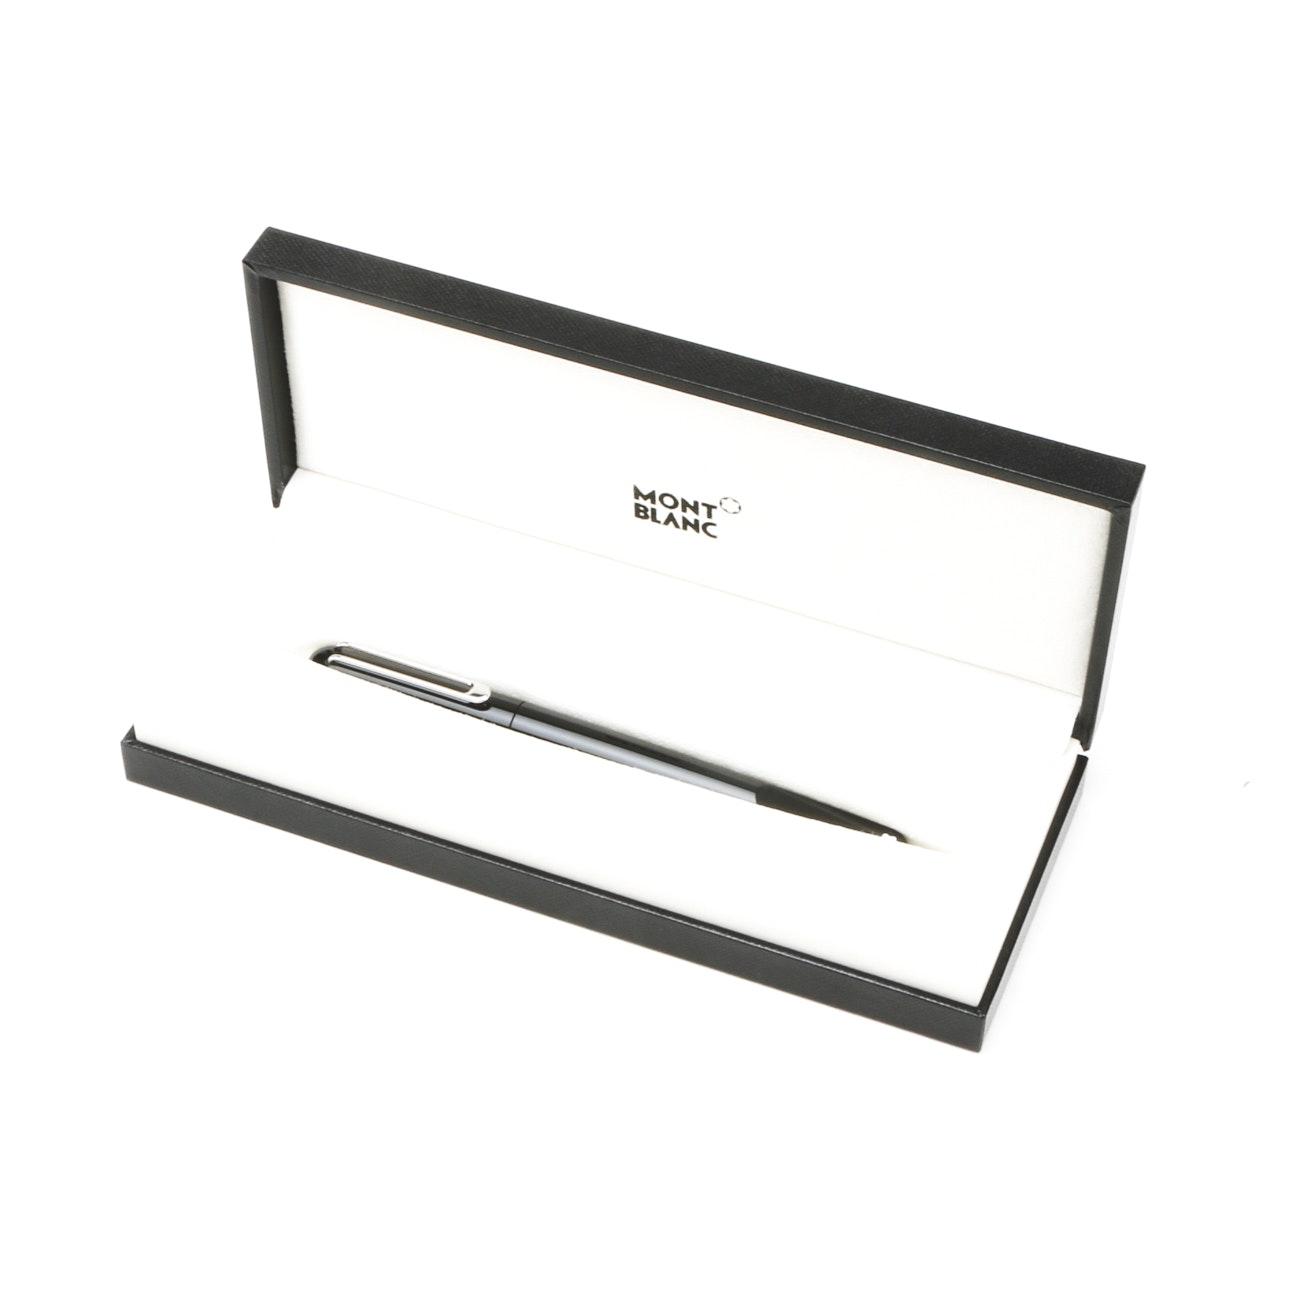 "Mont Blanc ""M"" Ballpoint Pen in Box"